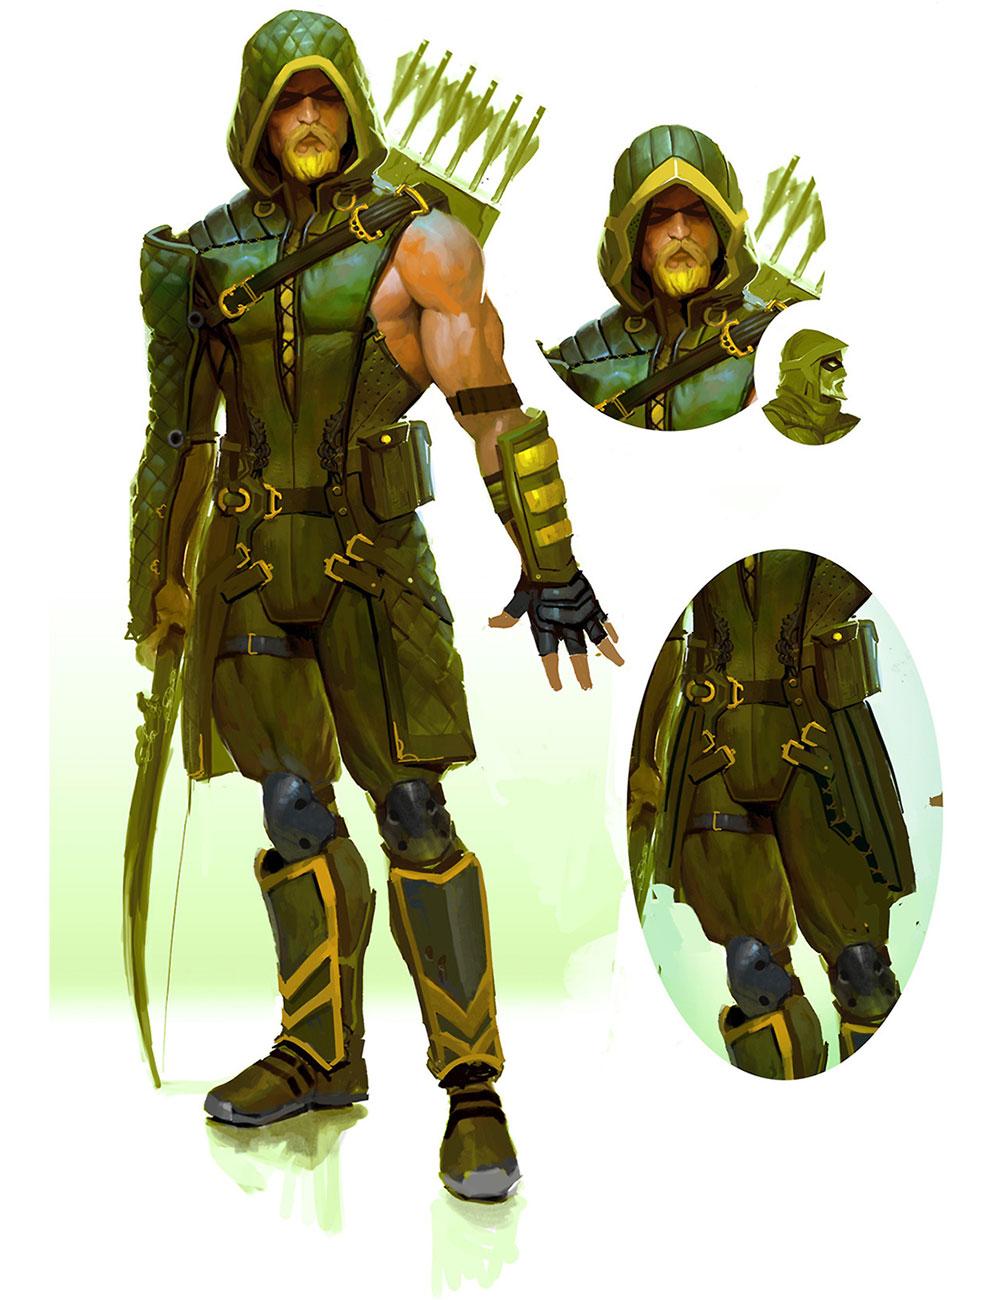 http://www.fightersgeneration.com/nx5/char/greenarrow-injustice-concept3.jpg